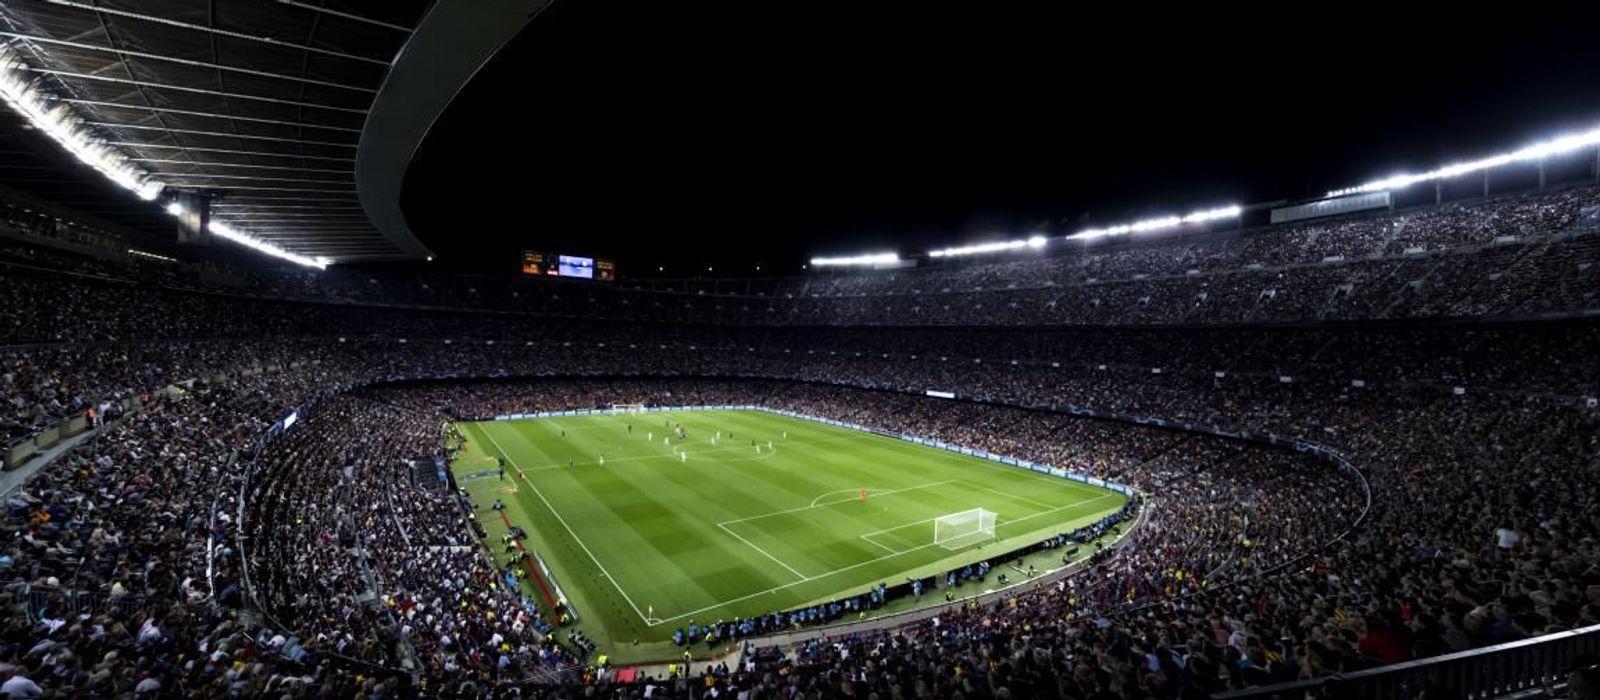 Fortress Camp Nou: A decade of impregnability